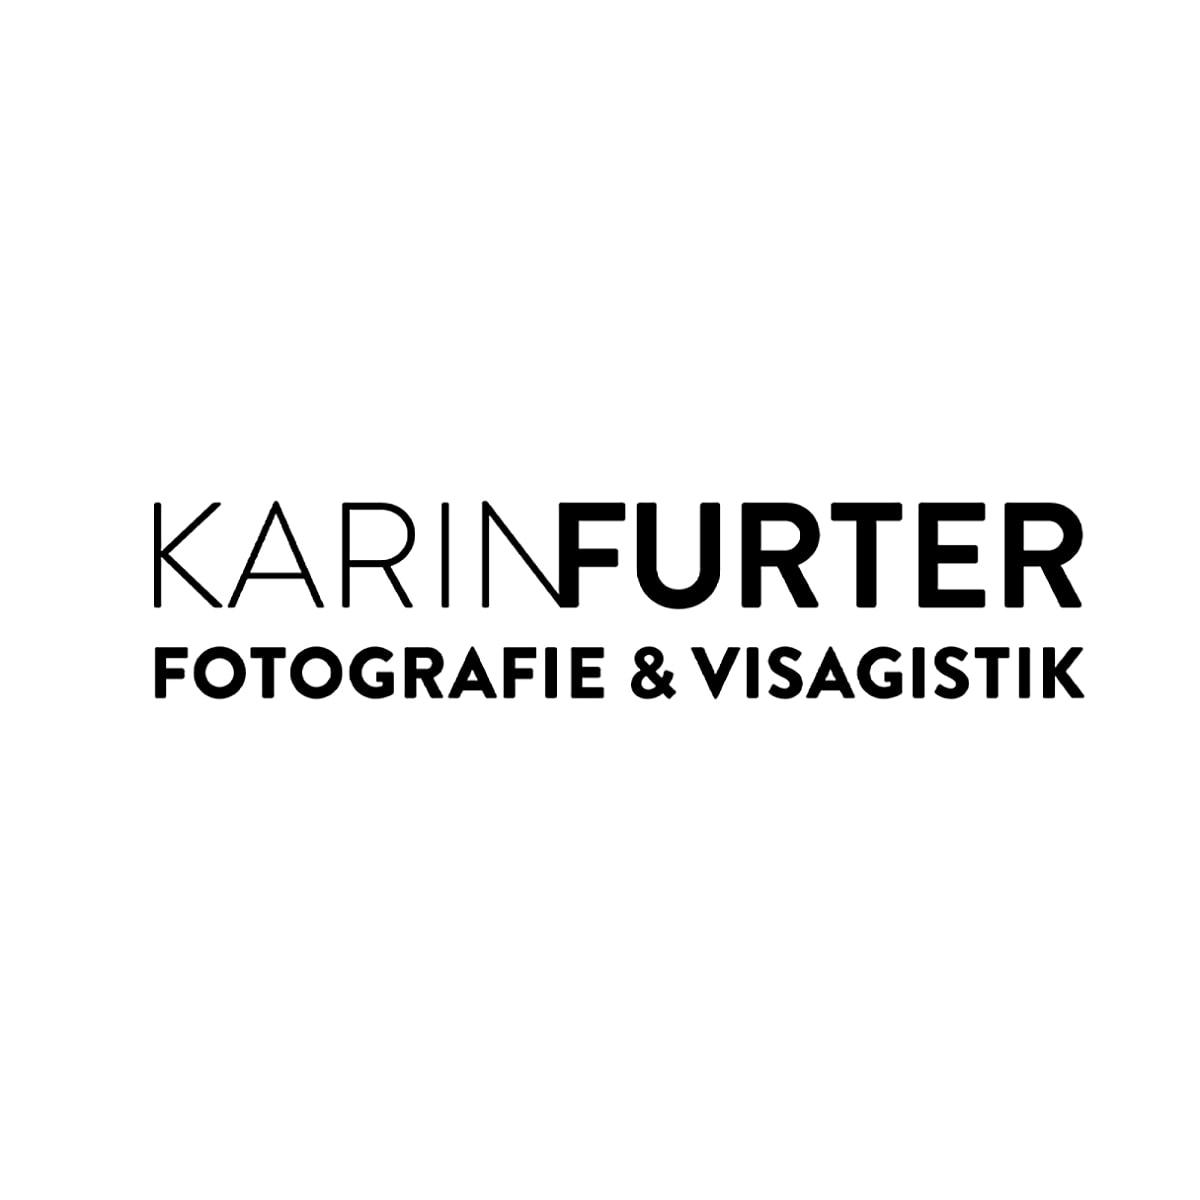 Furter Karin